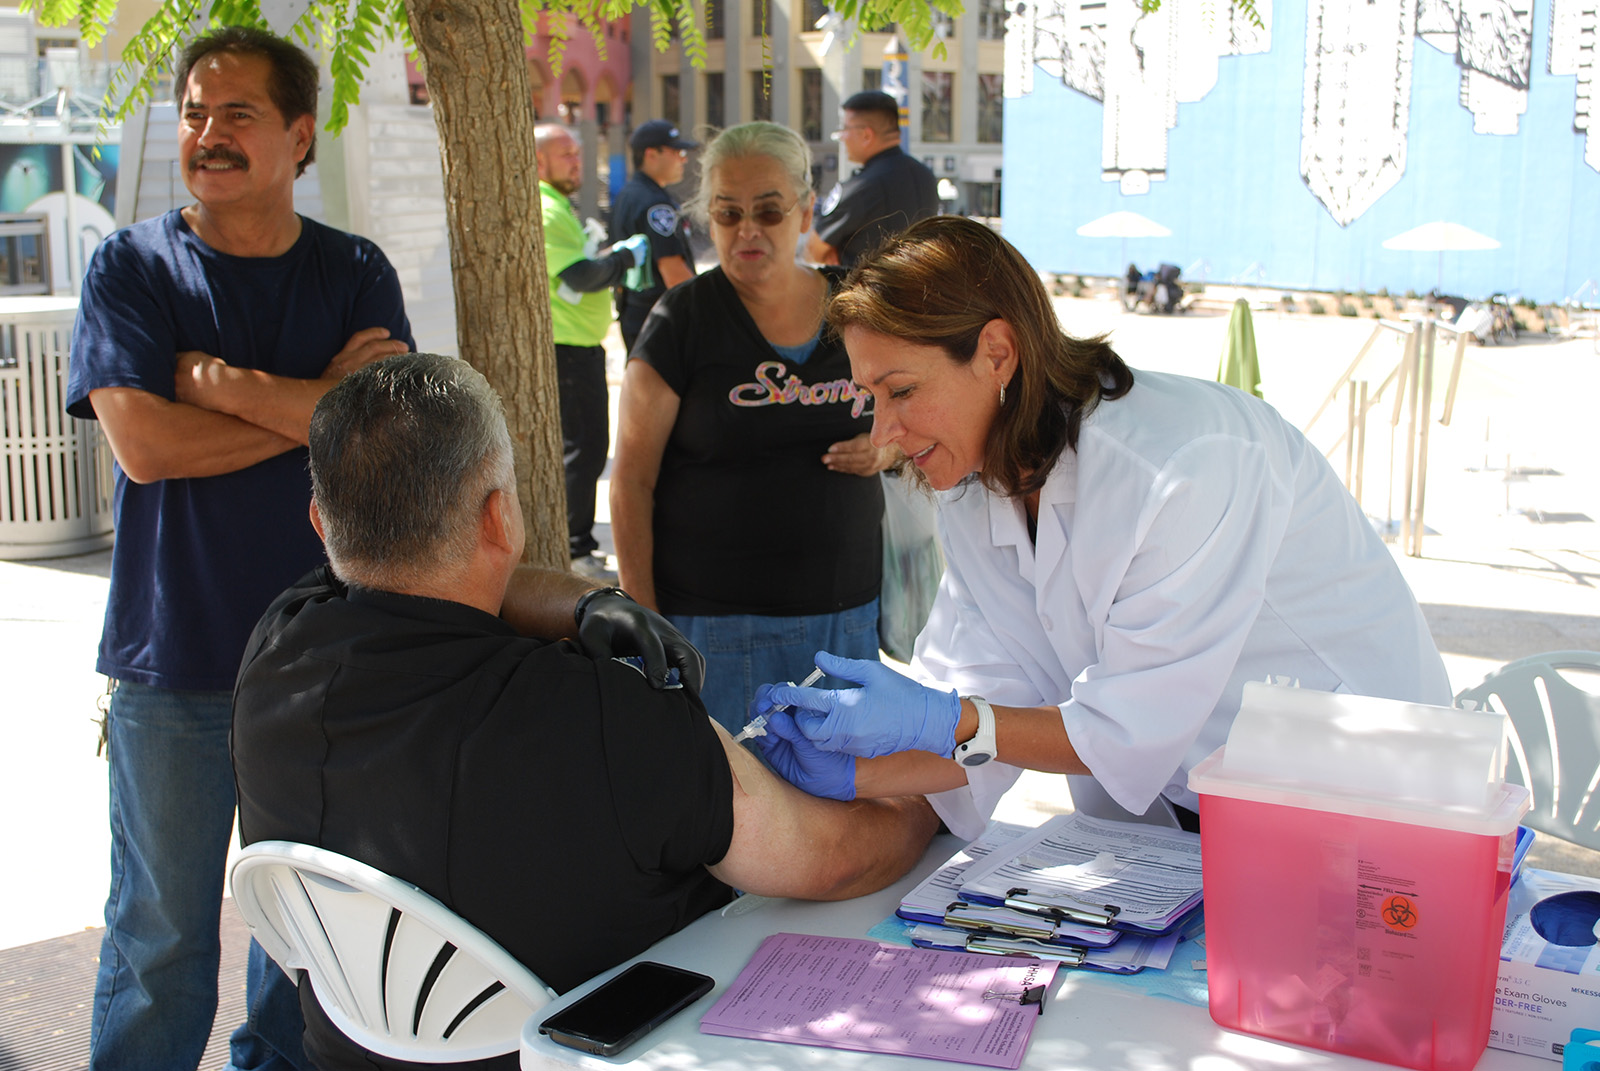 County nurse Paulina Bobenrieth vaccinates a patient in downtown San Diego.